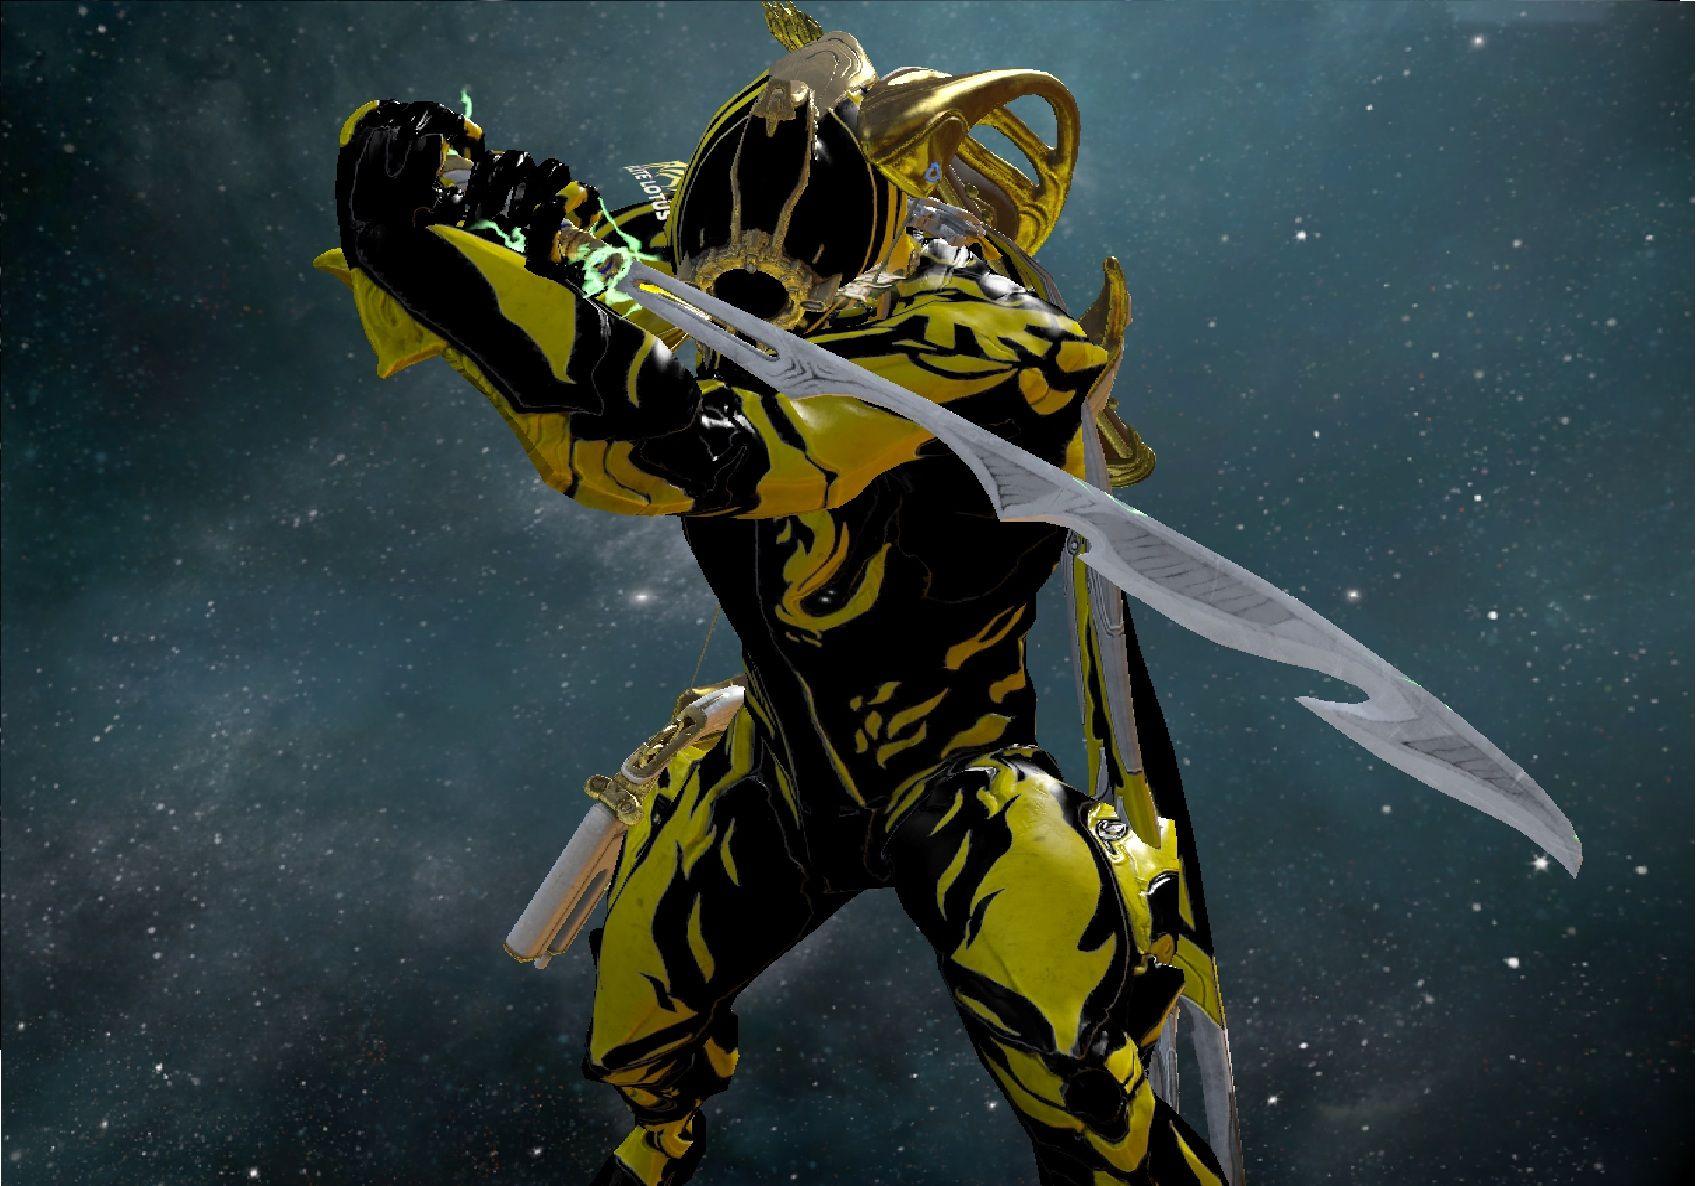 Warframe Excalibur Immortal Skin